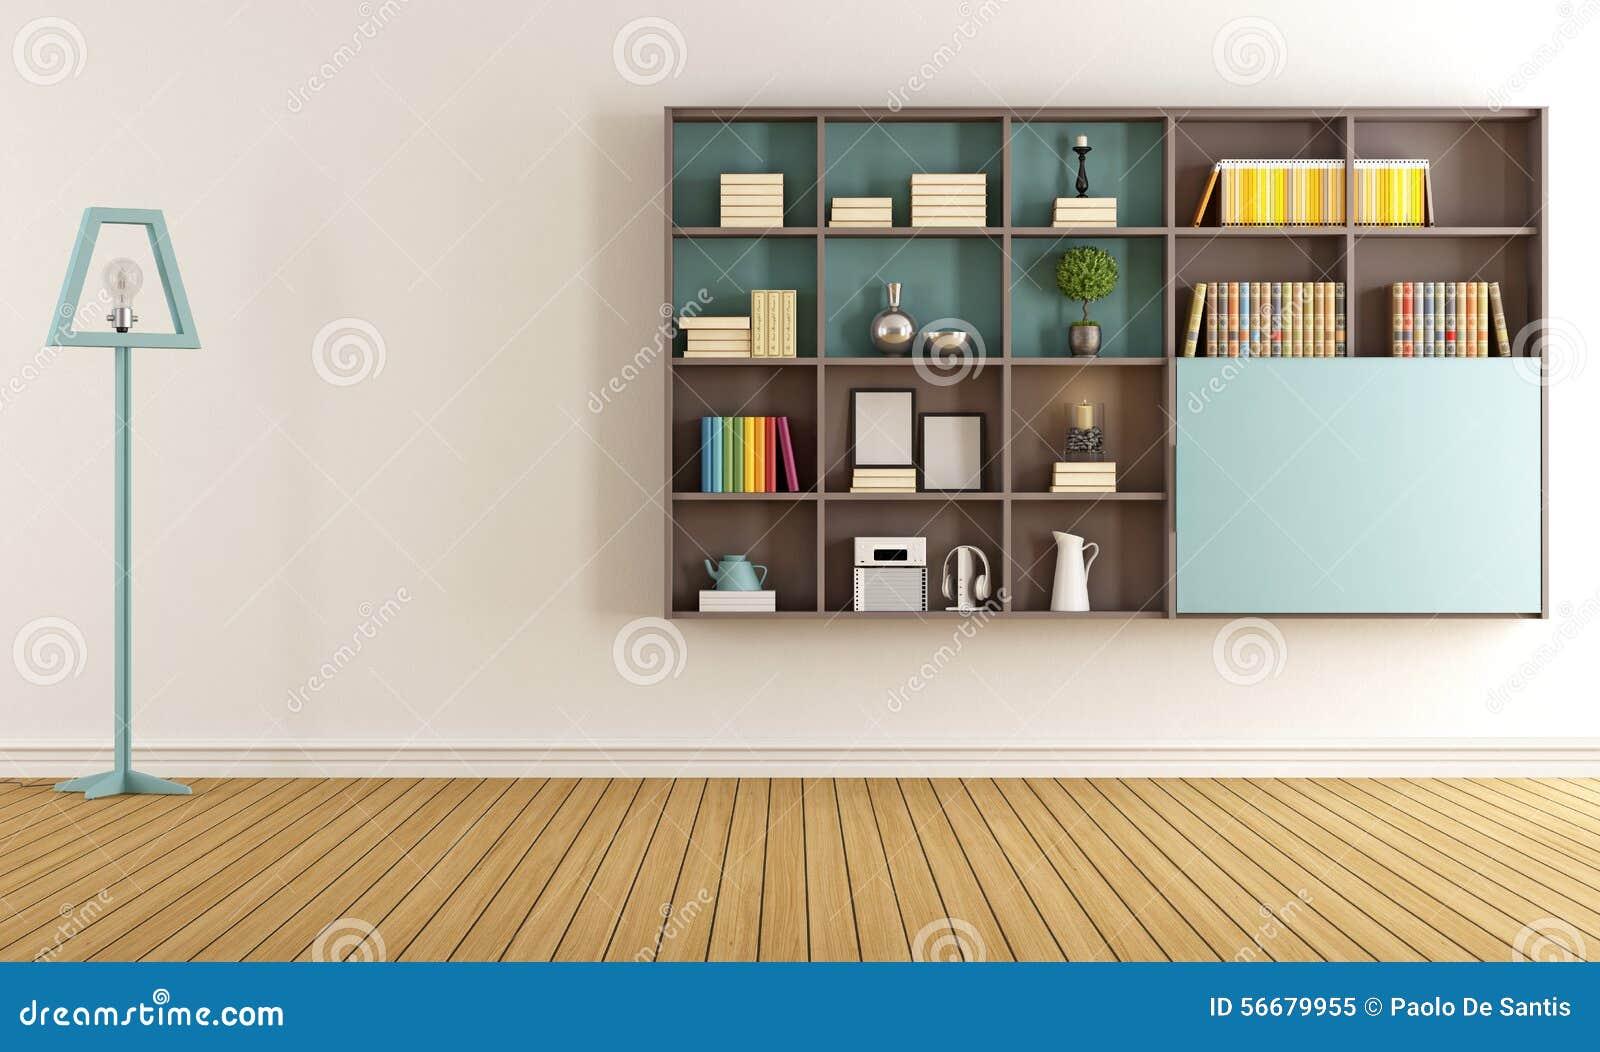 Living room with modern bookcase stock illustration illustration